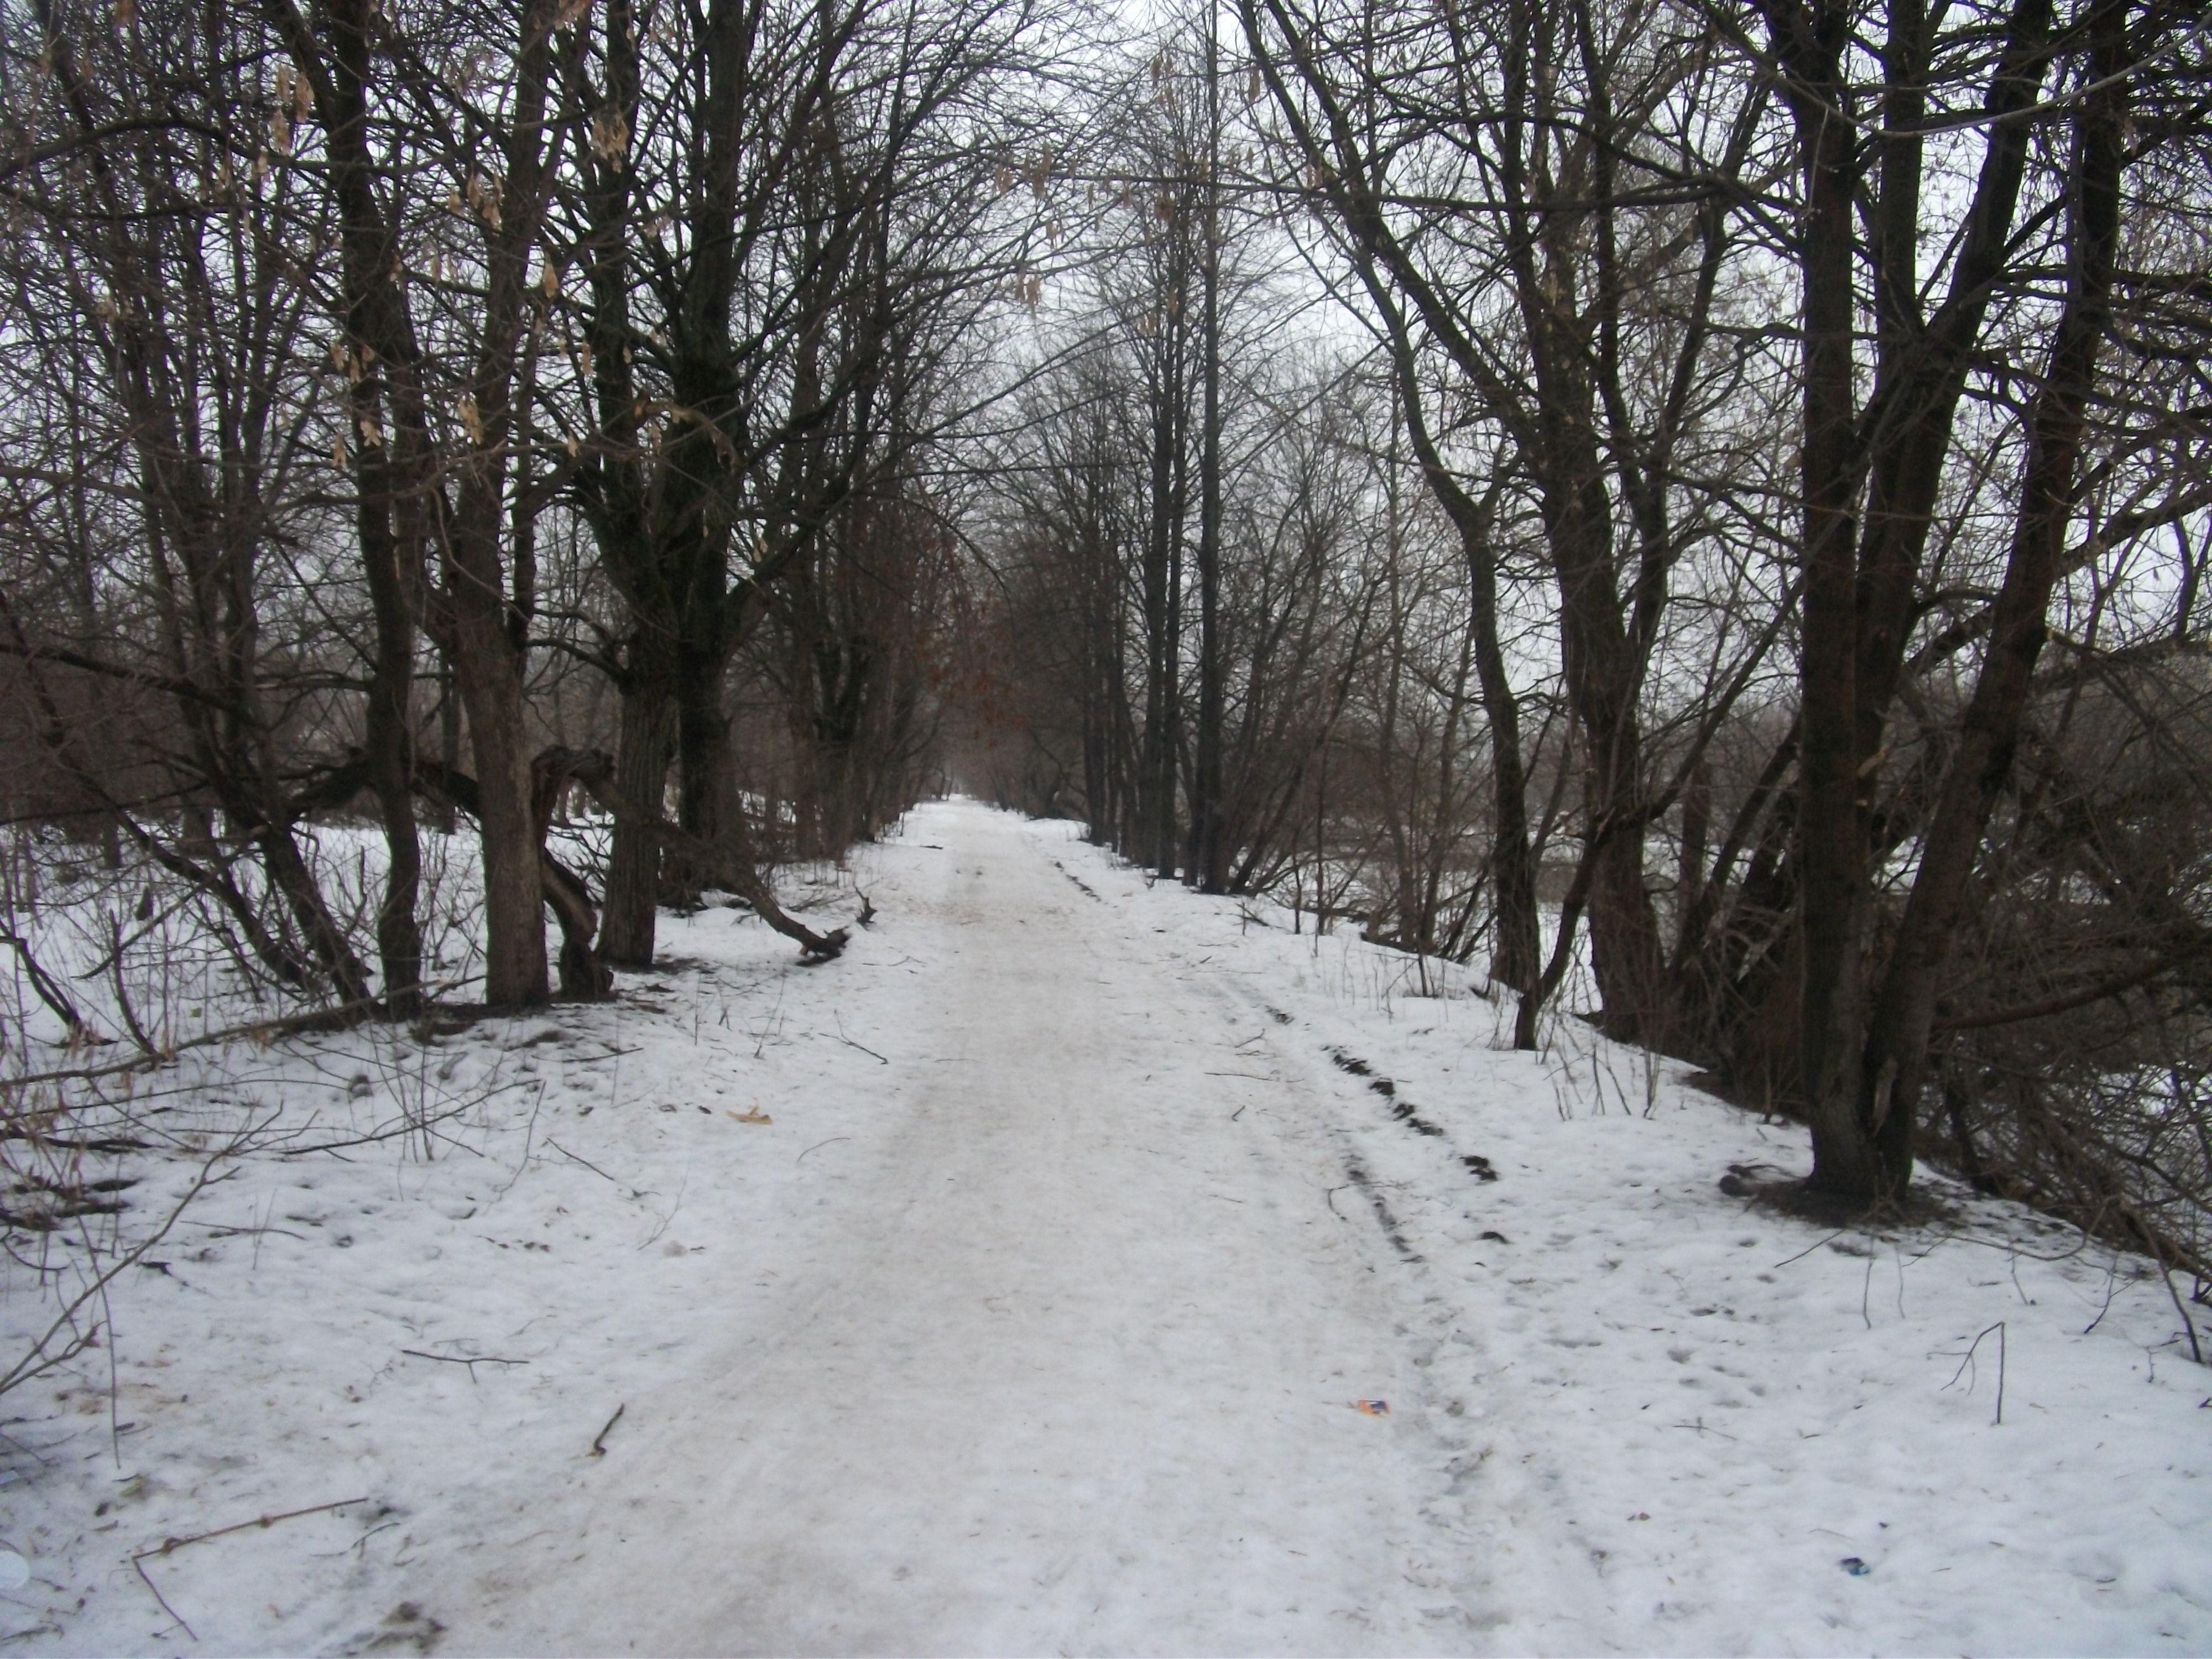 River Uvod, Ivanovo, Russia 15/02/2014